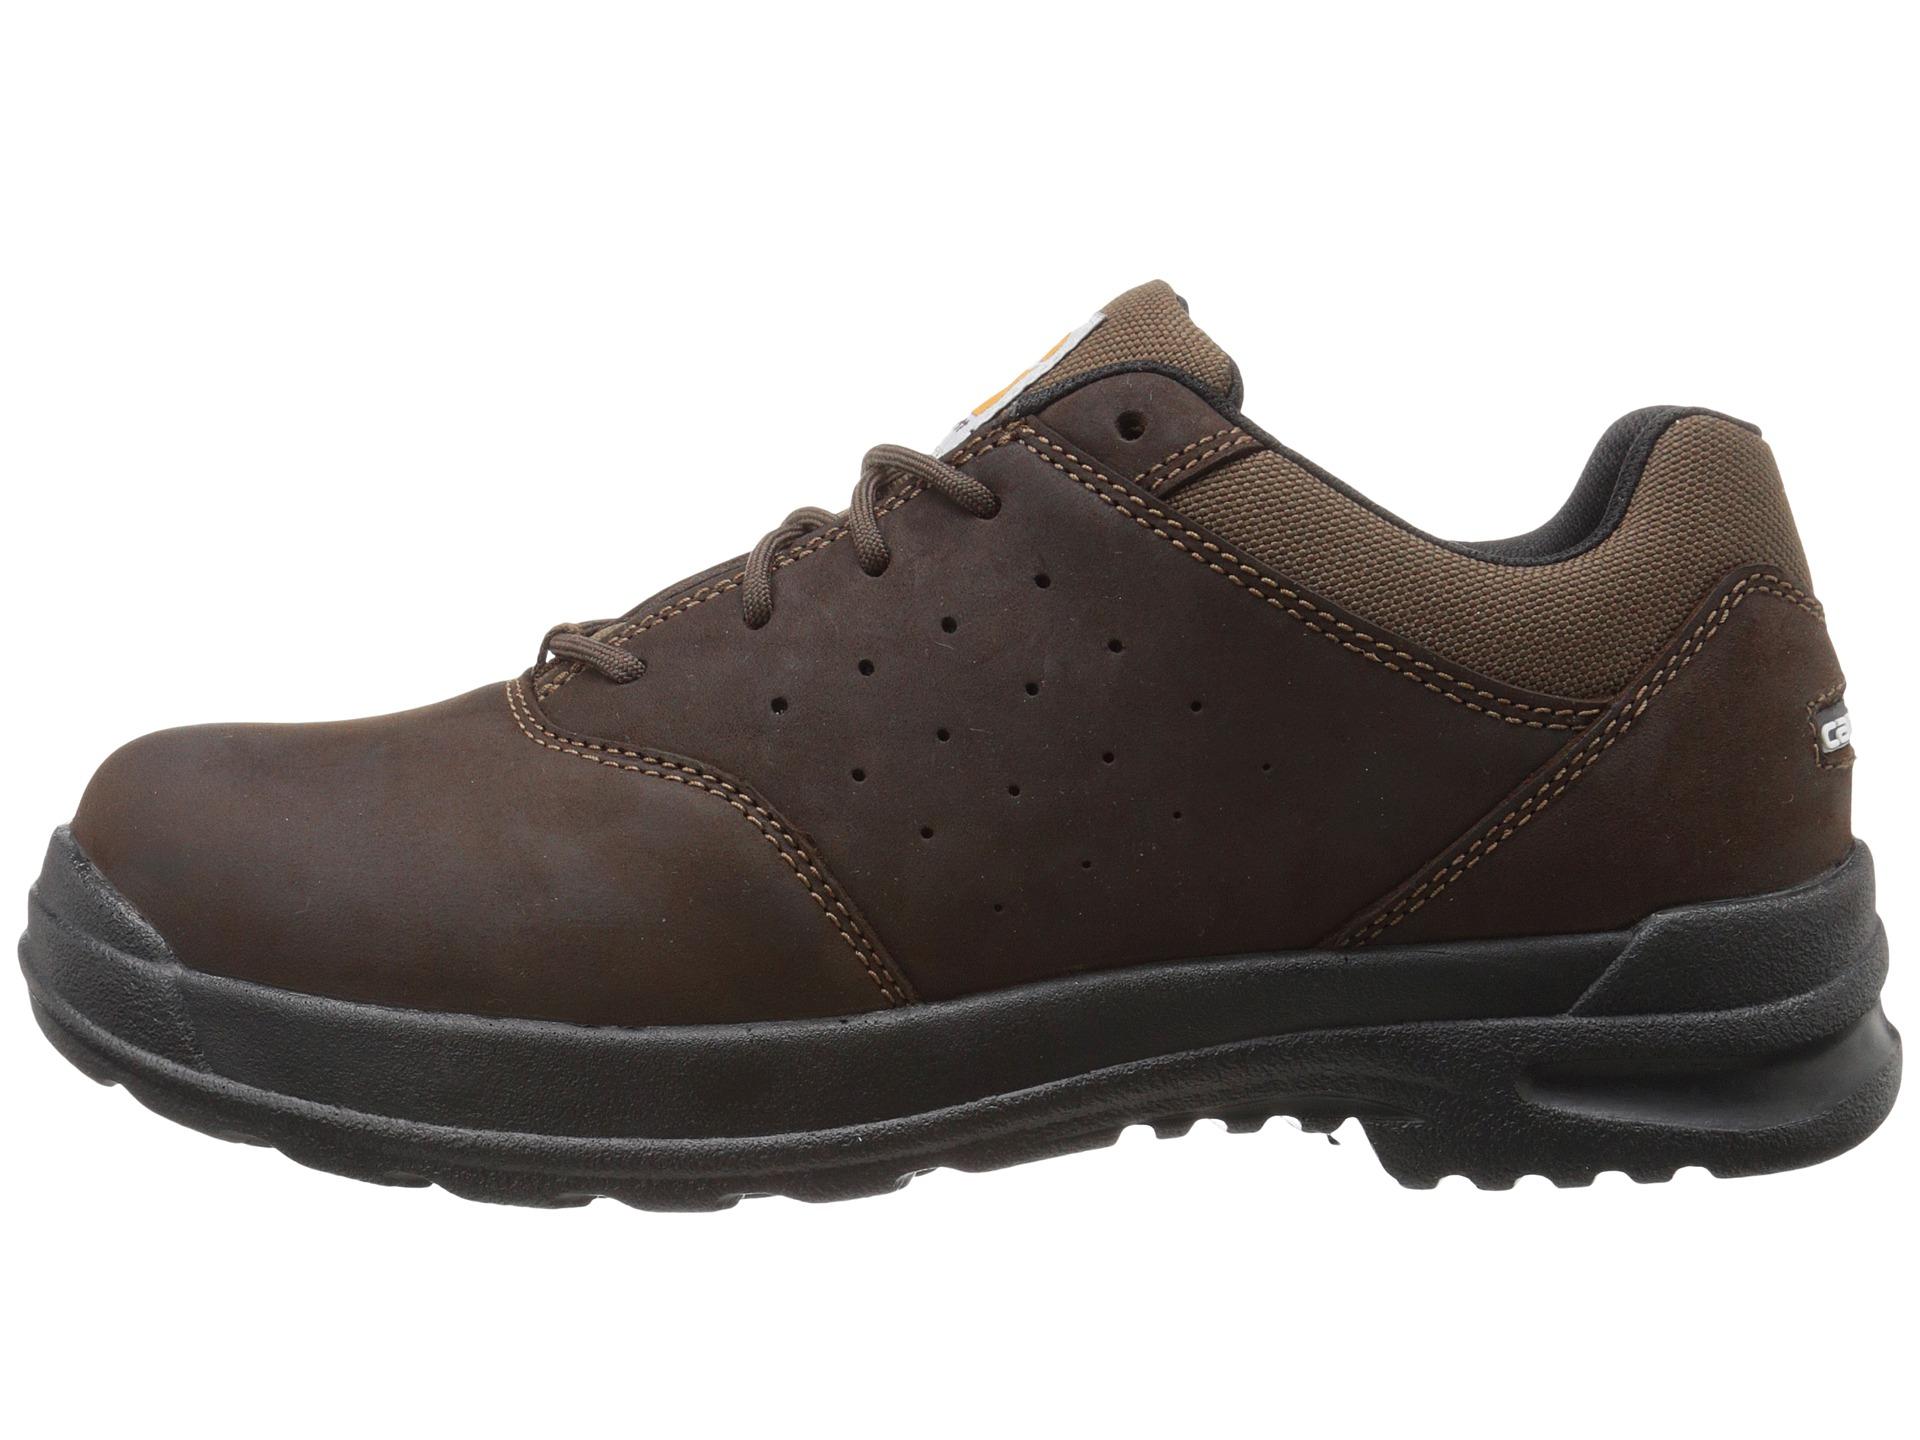 Black Or Brown Polishable Shoe